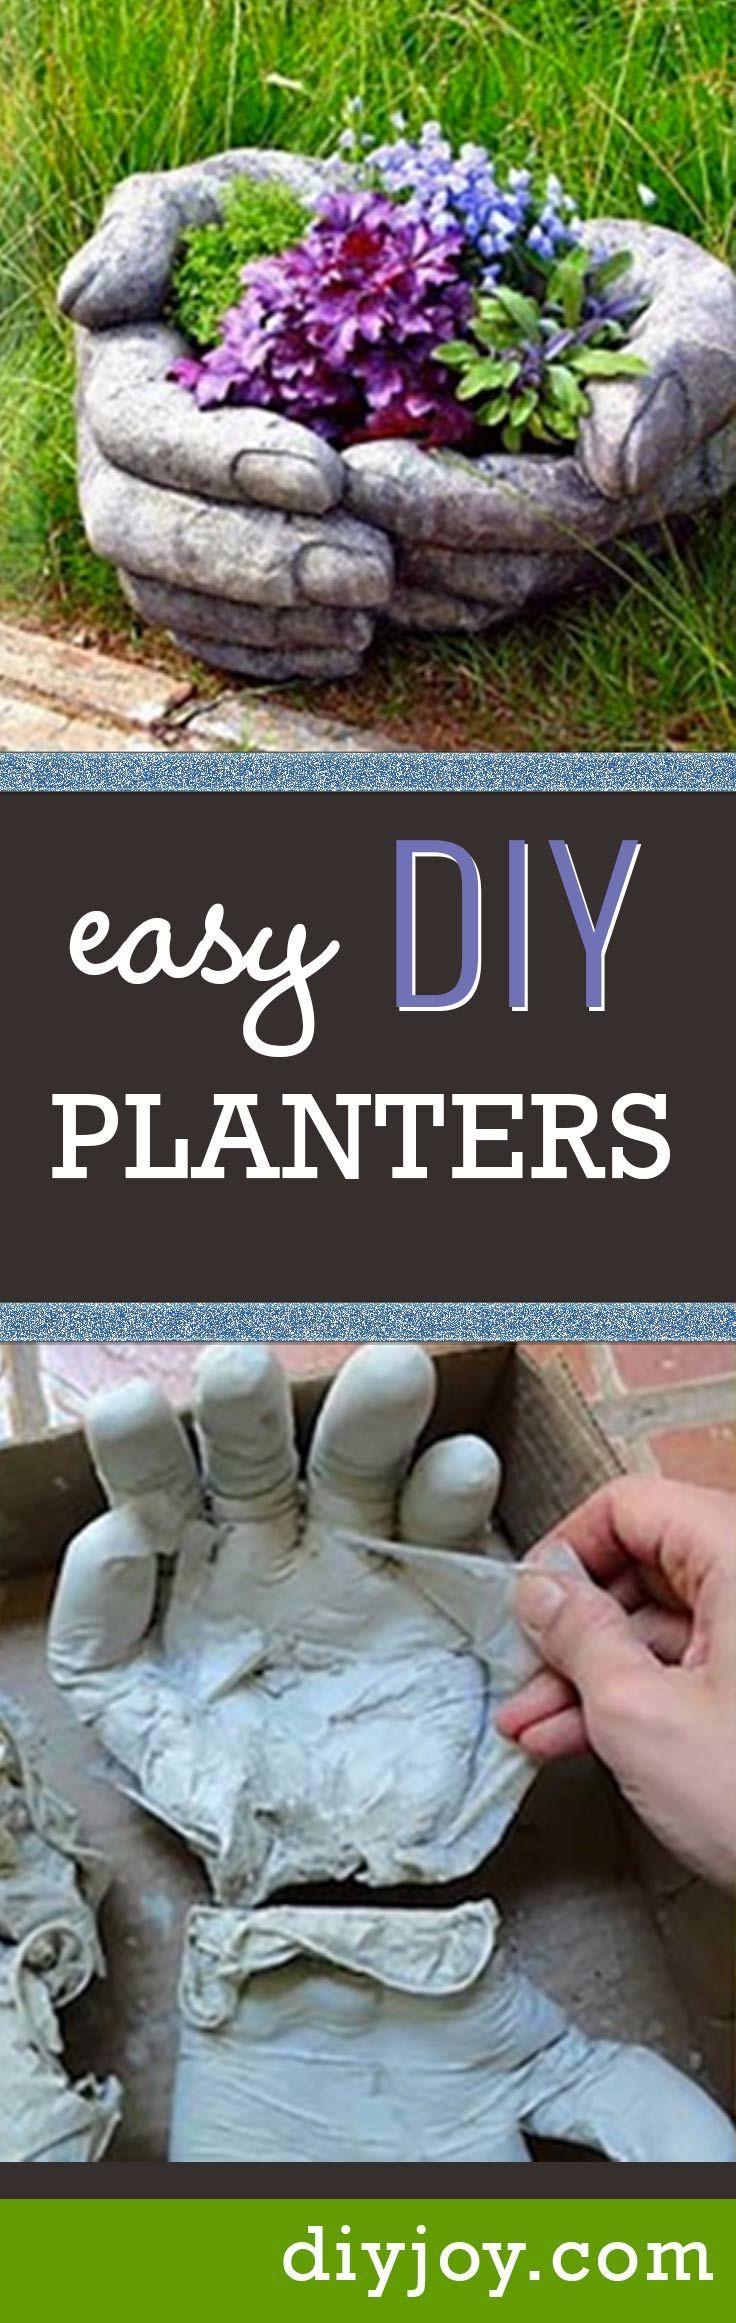 Homemade garden art ideas - Easy Diy Planters For Cool Do It Yourself Gardening Idea Concrete Pots In Hand Shade